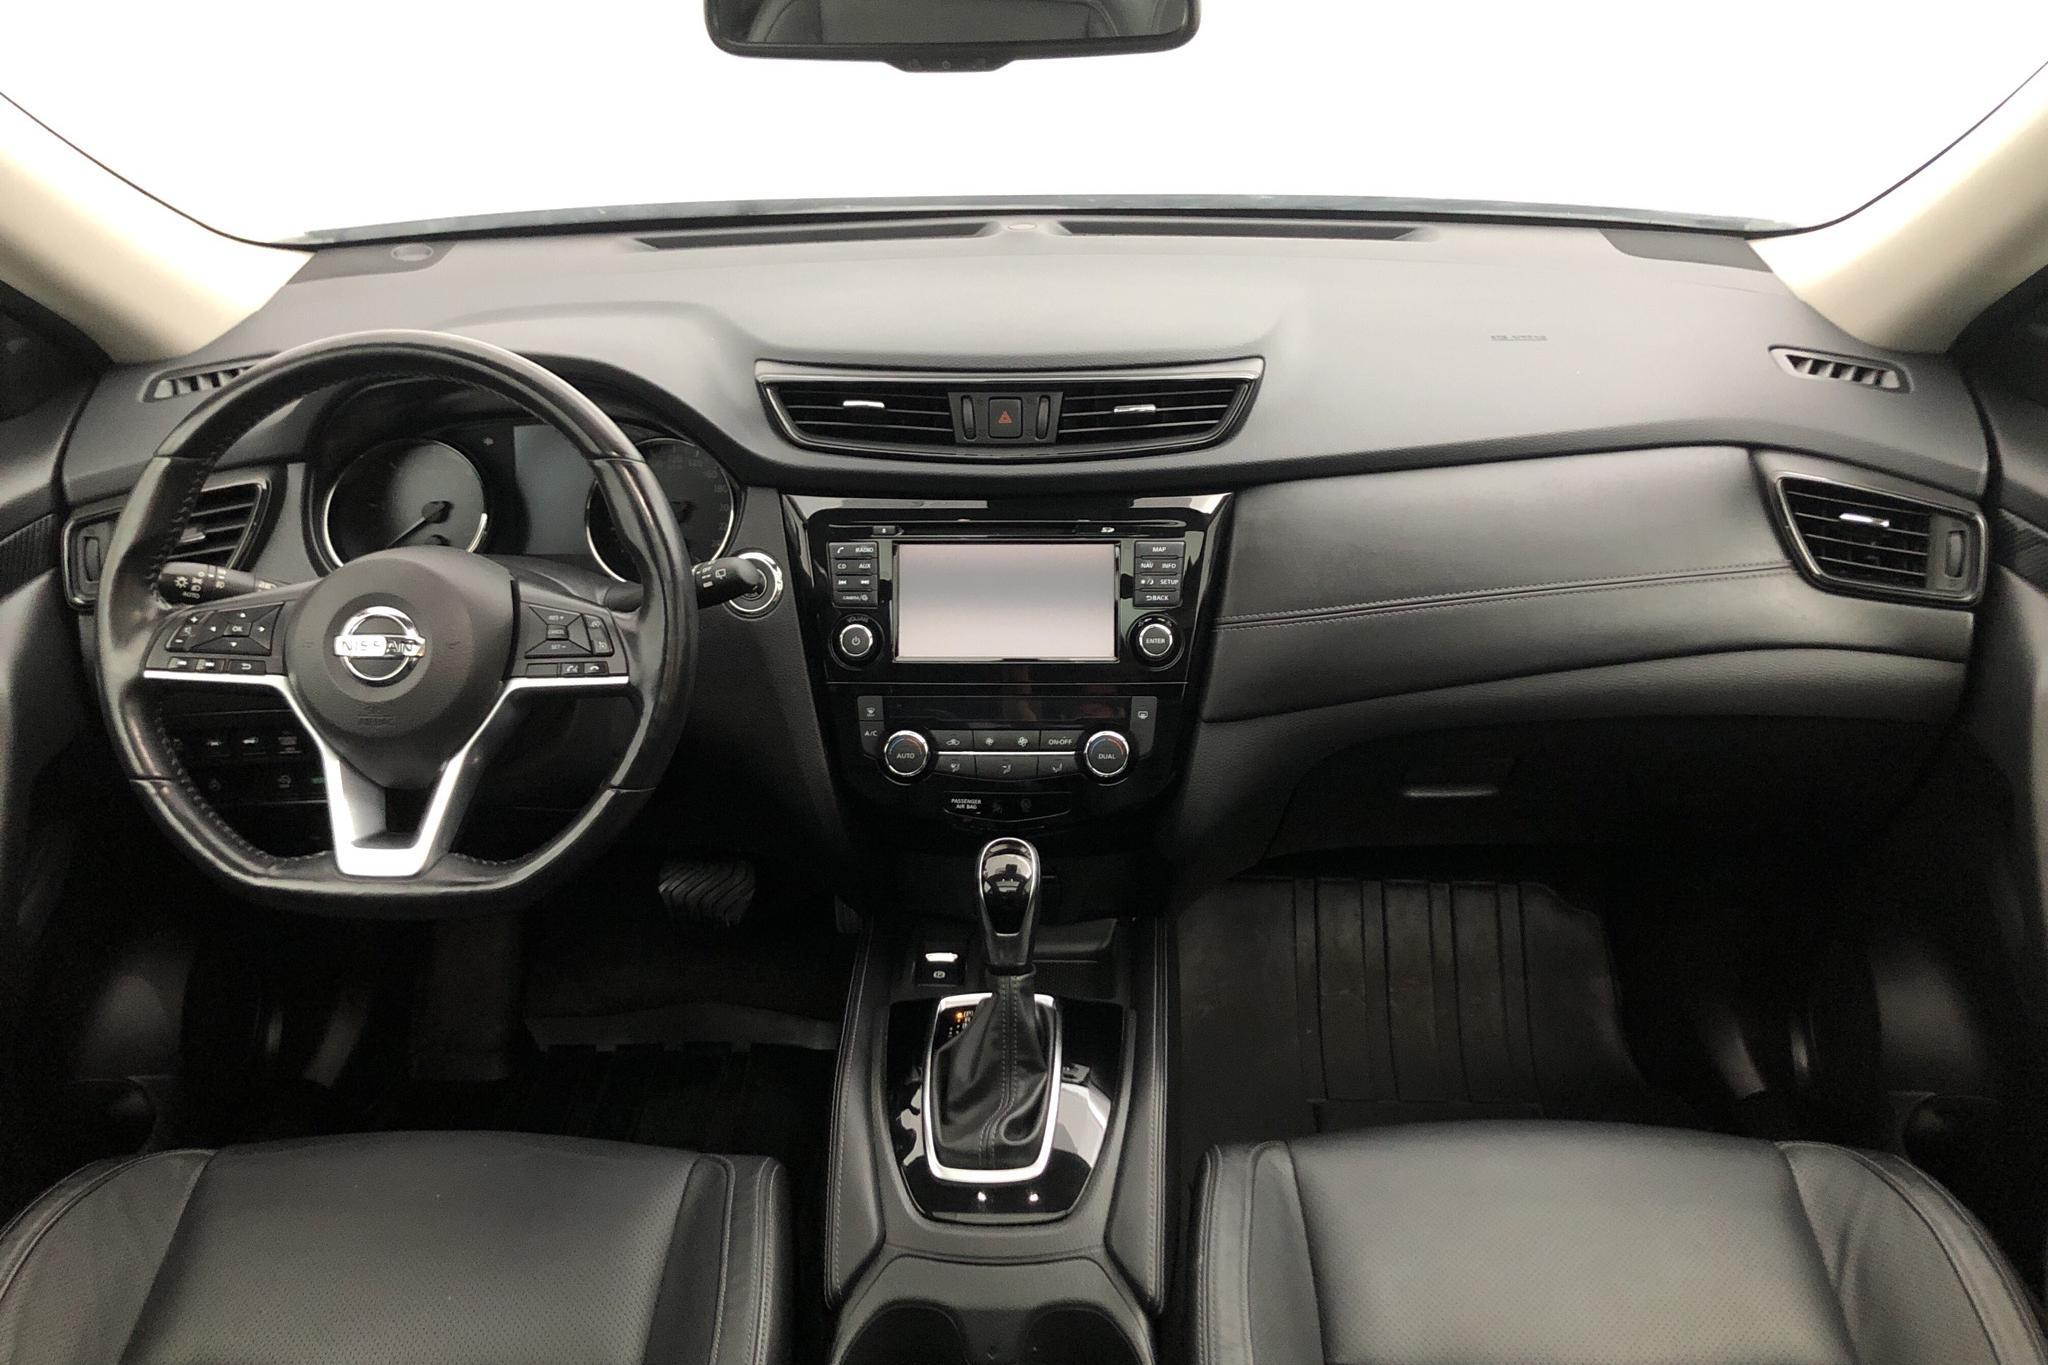 Nissan X-trail 1.6 dCi 2WD (130hk) - 42 620 km - Automatic - white - 2017